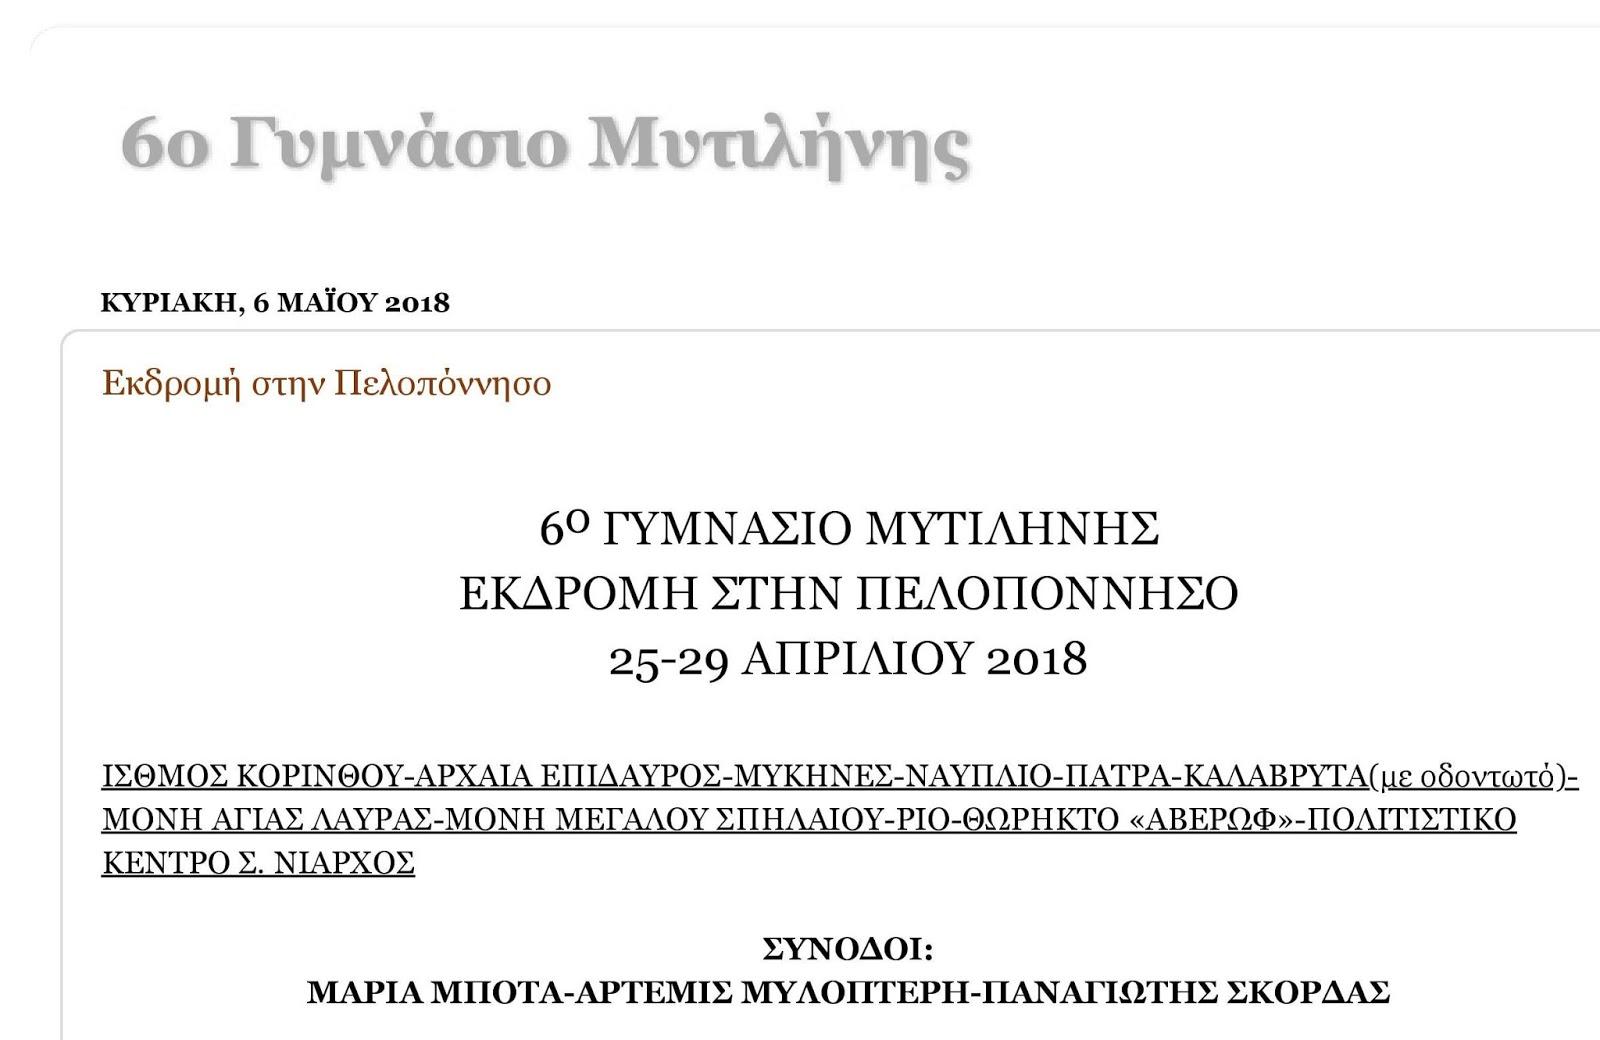 a936f0a72d9 Σας ενημερώνουμε ότι πριν λίγες μέρες ξεκίνησε και λειτουργεί ο νέος  ιστότοπος του σχολείου μας στη διεύθυνση  http://6ogymnasiomitilinis.blogspot.gr .